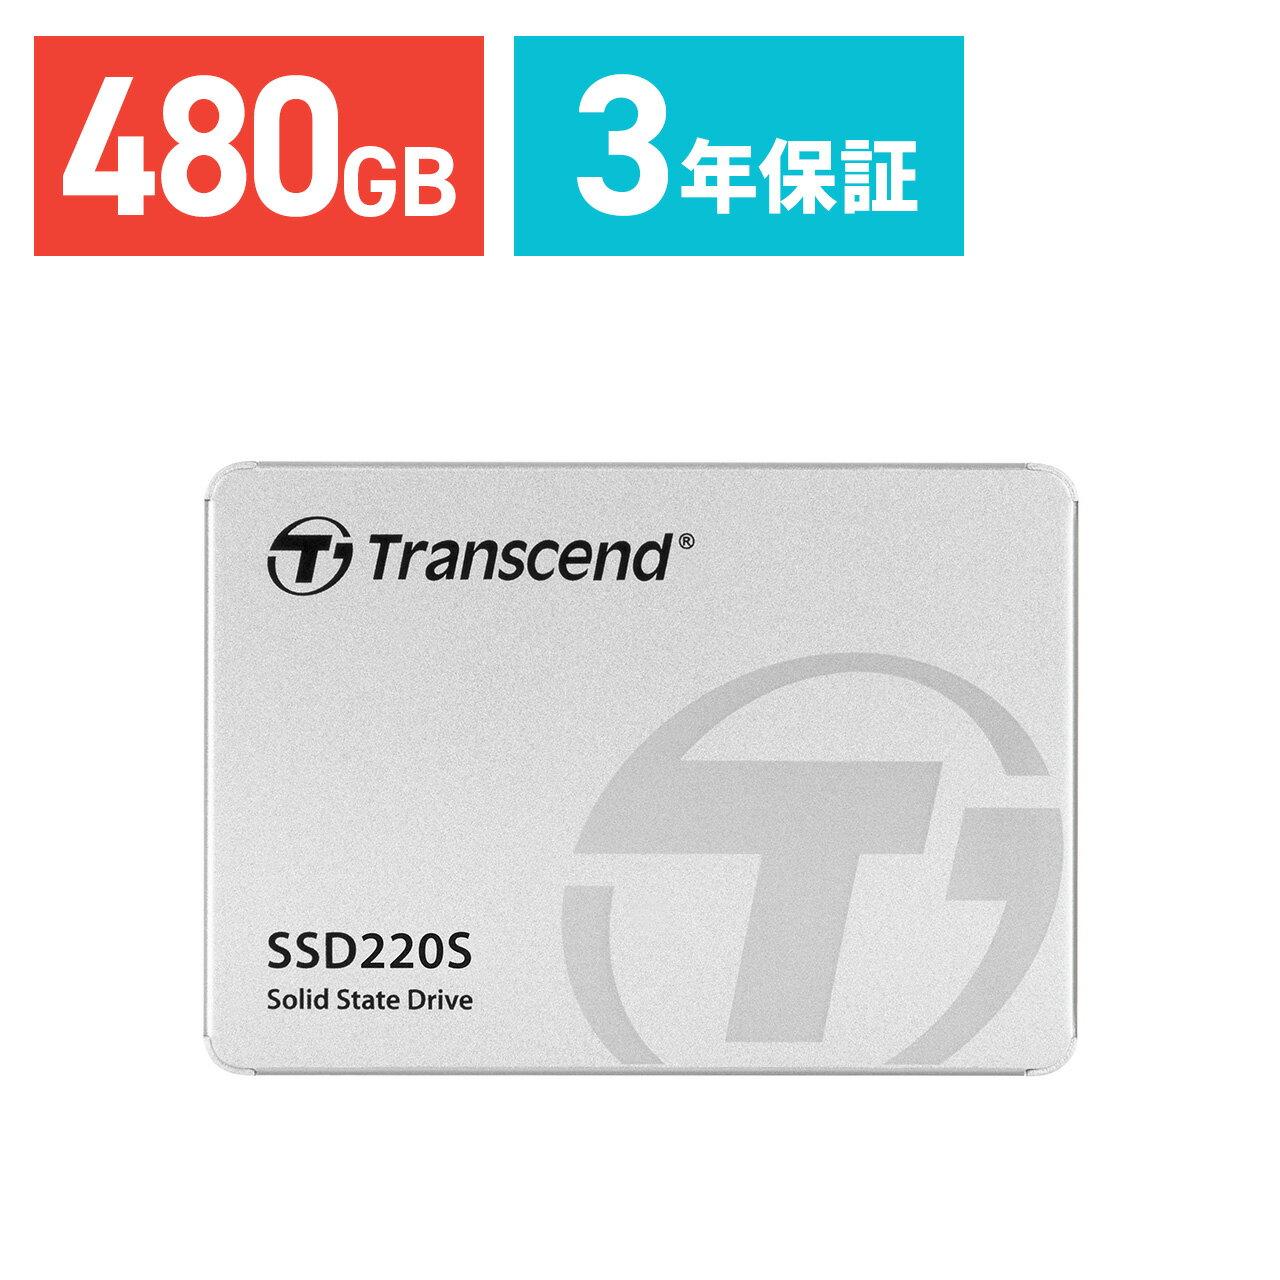 Transcend SSD 2.5インチ 480GB SATA-III対応 6Gb/s[TS480GSSD220S]【送料無料】